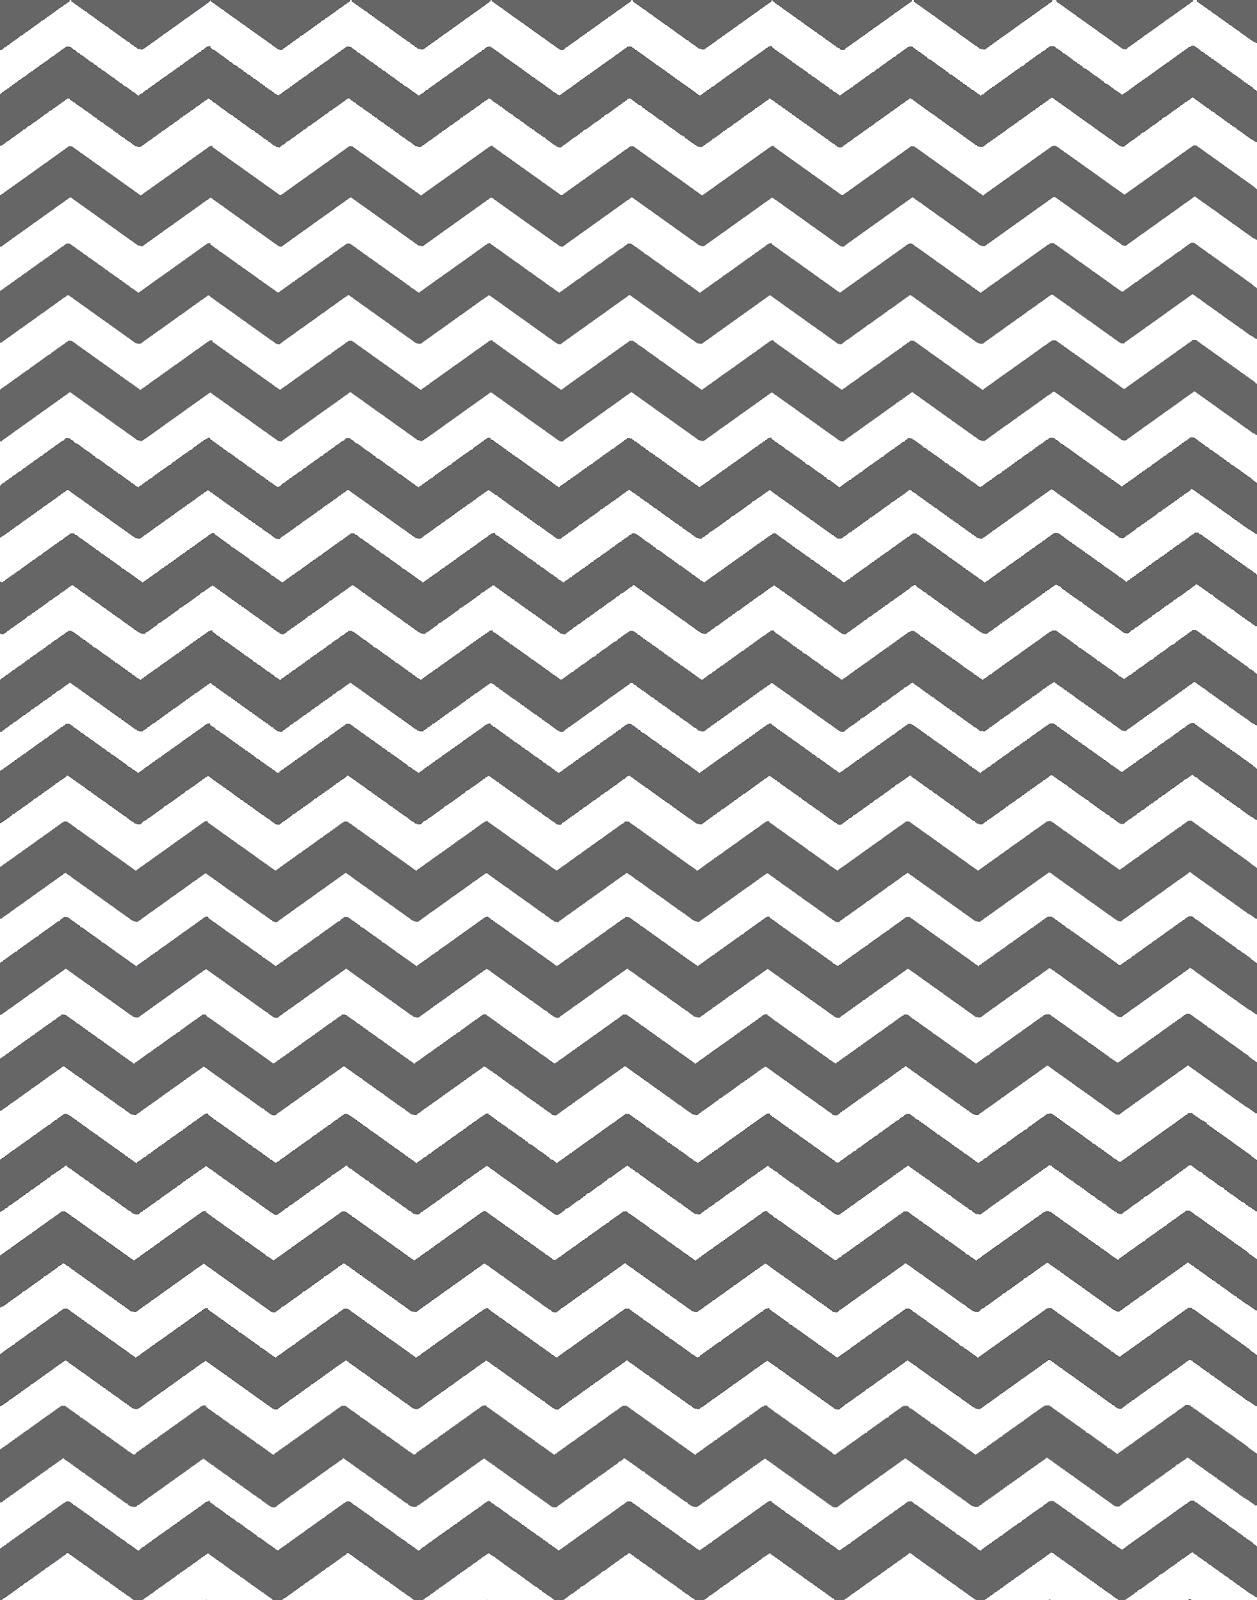 gray+grey+chevron+background+paper+pattern.jpg